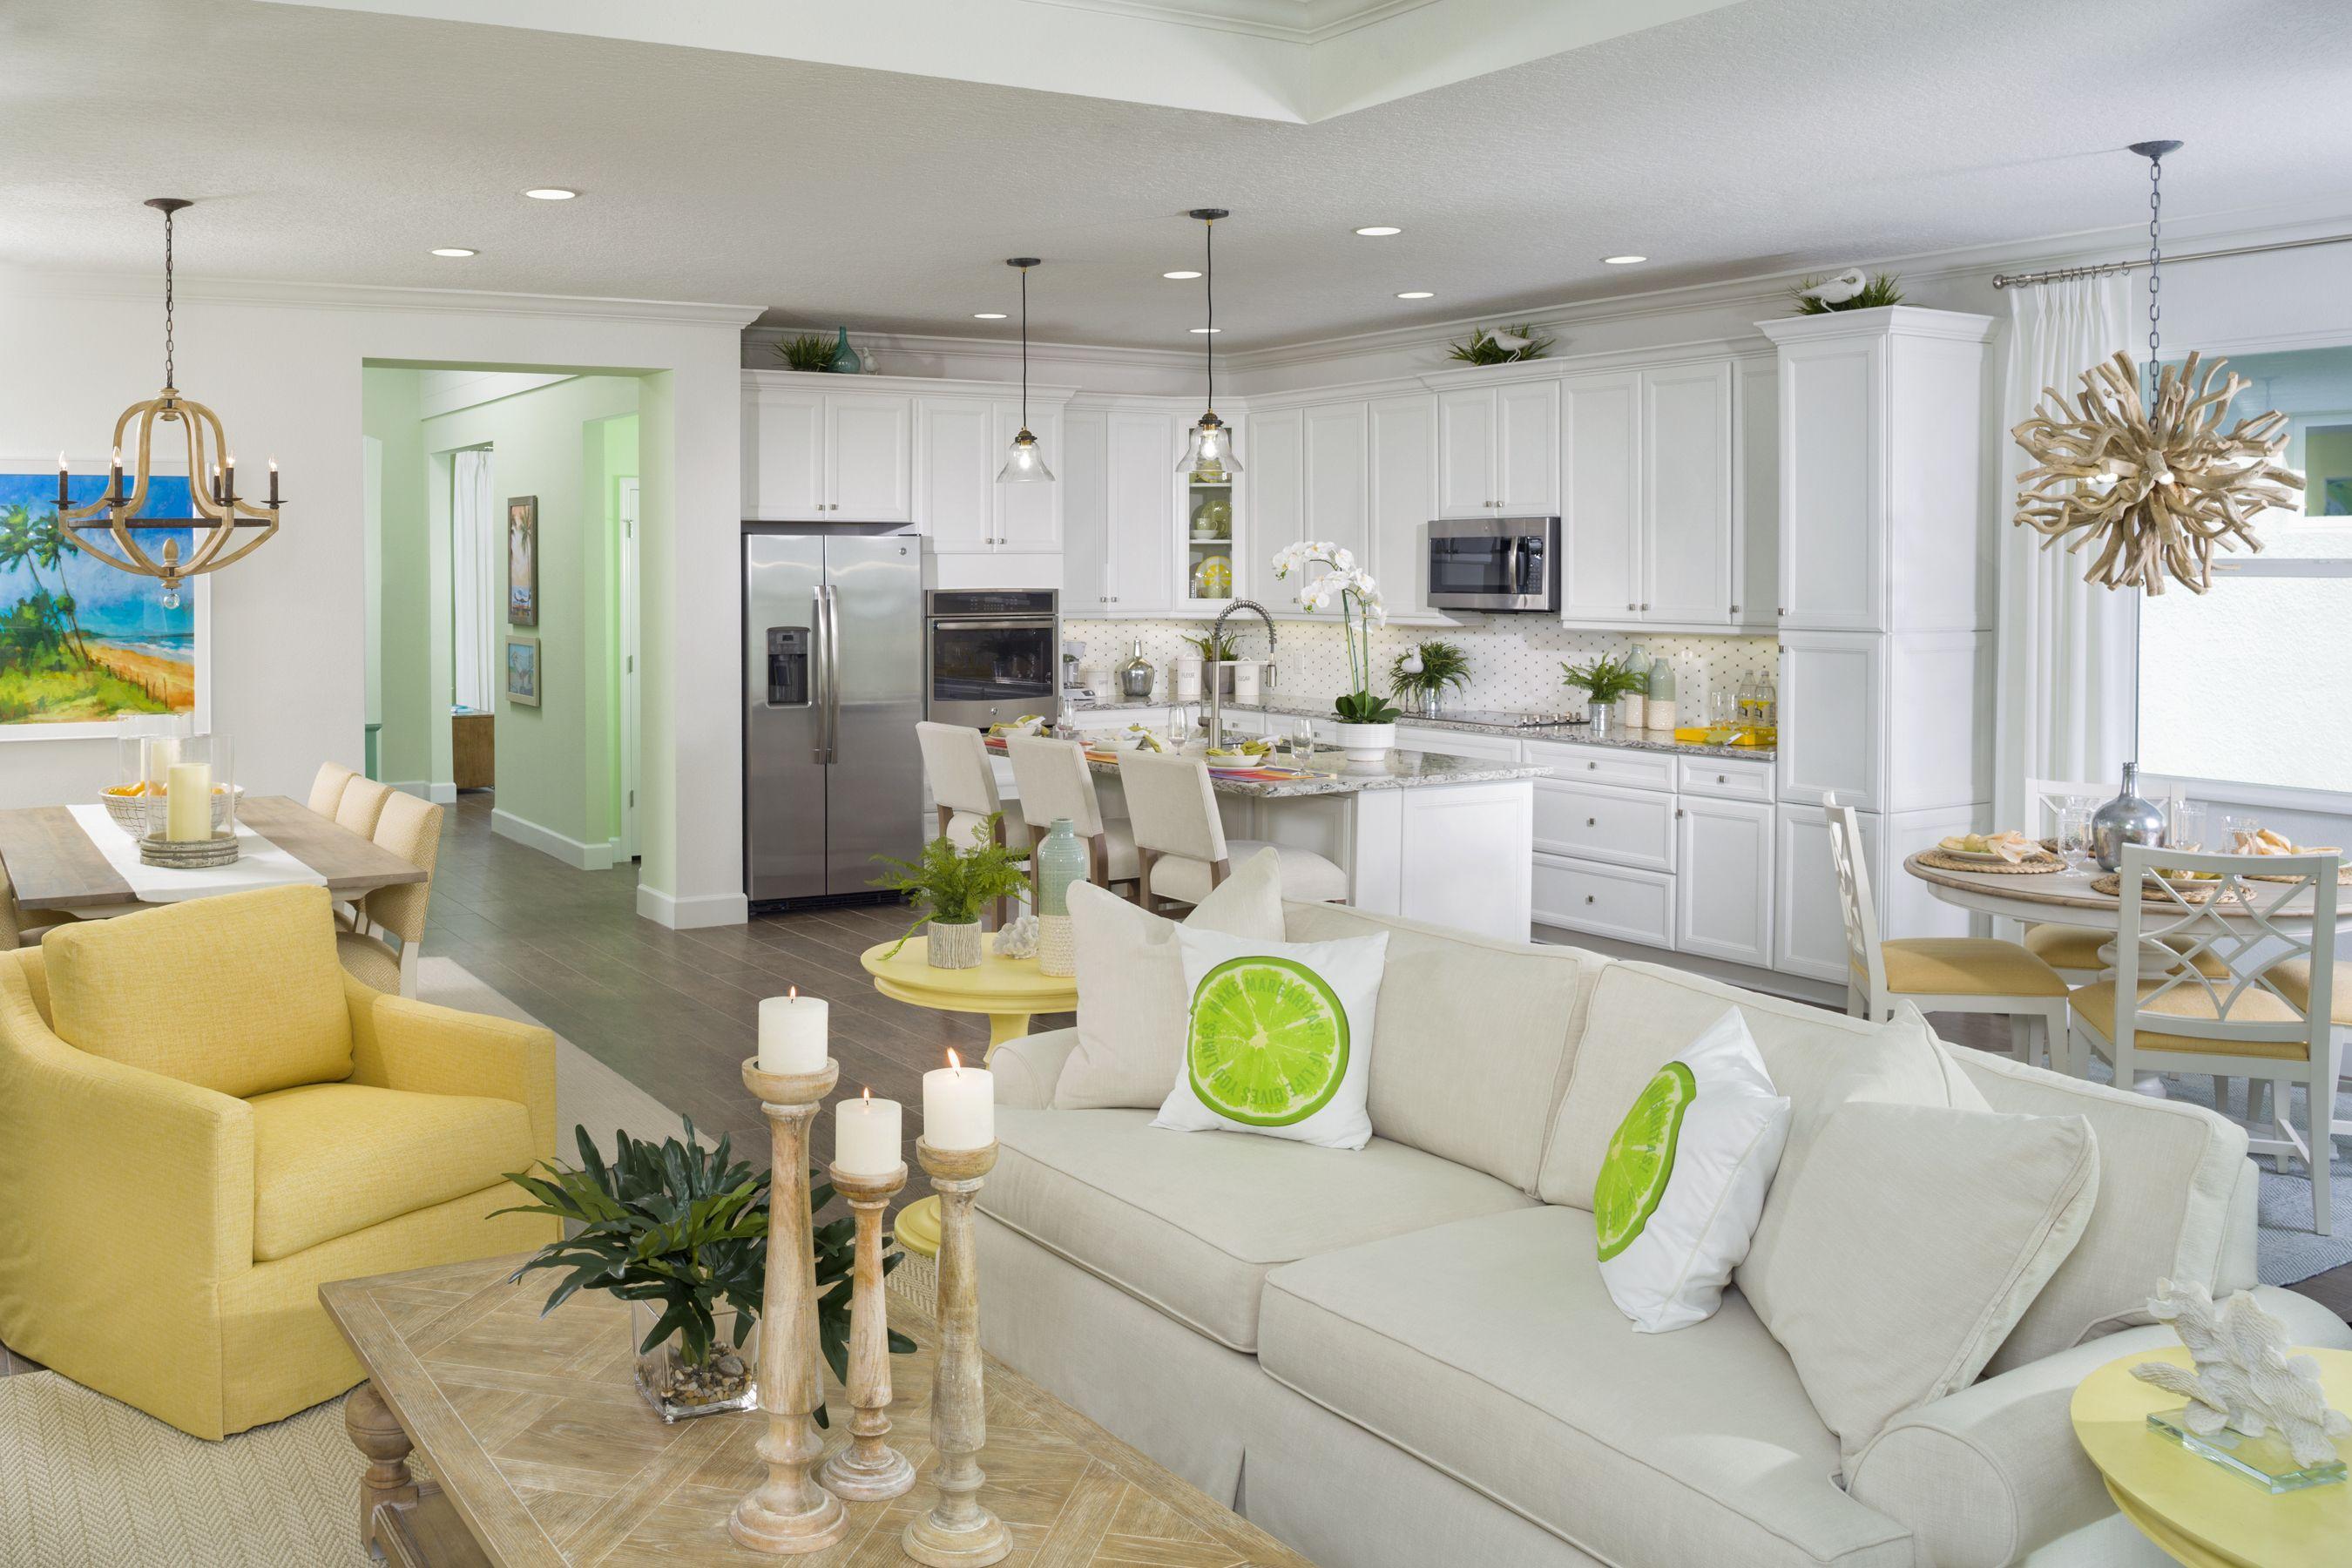 Breeze Model At Latitude Margaritaville Daytona Beach Minto Communities Retirement Community Home Buffet Decor